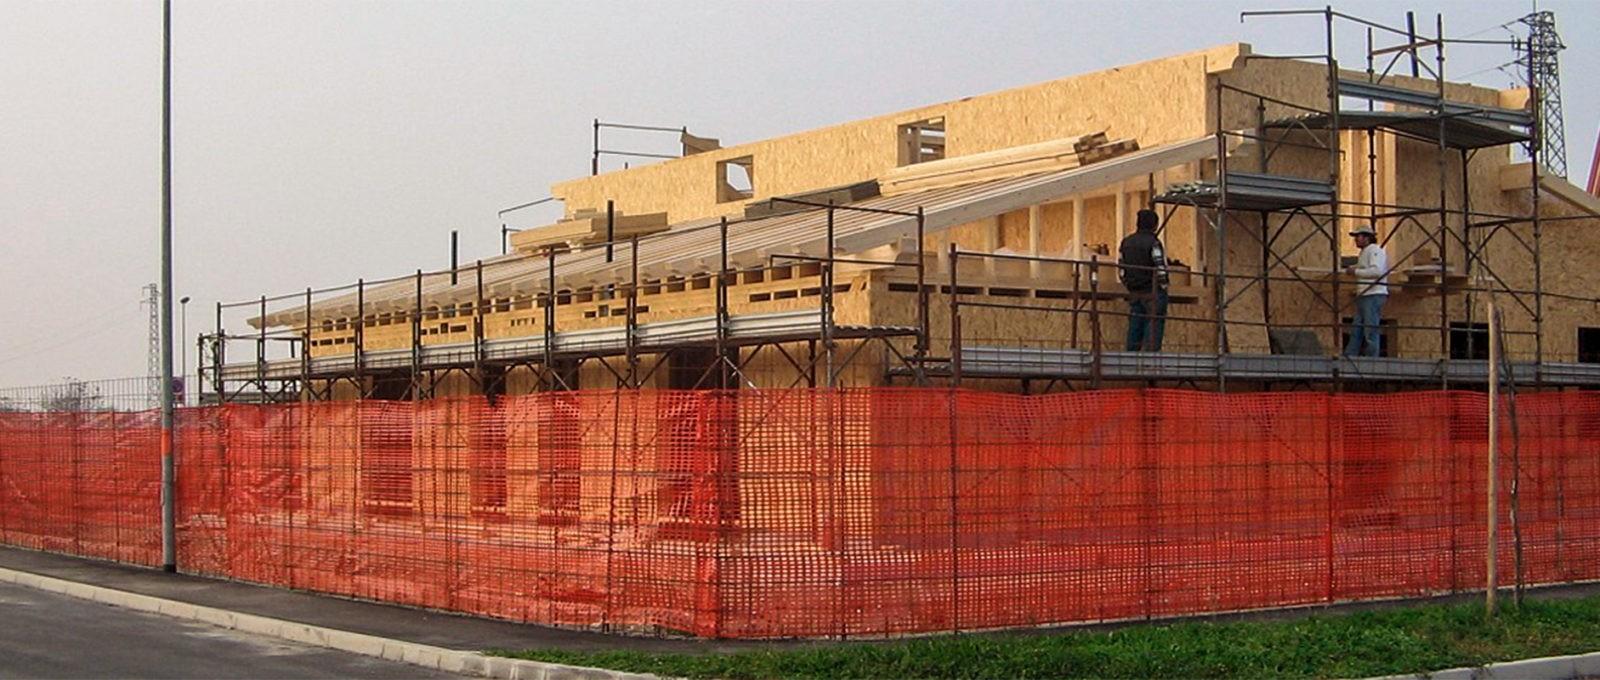 Case in legno con sistema a telaio